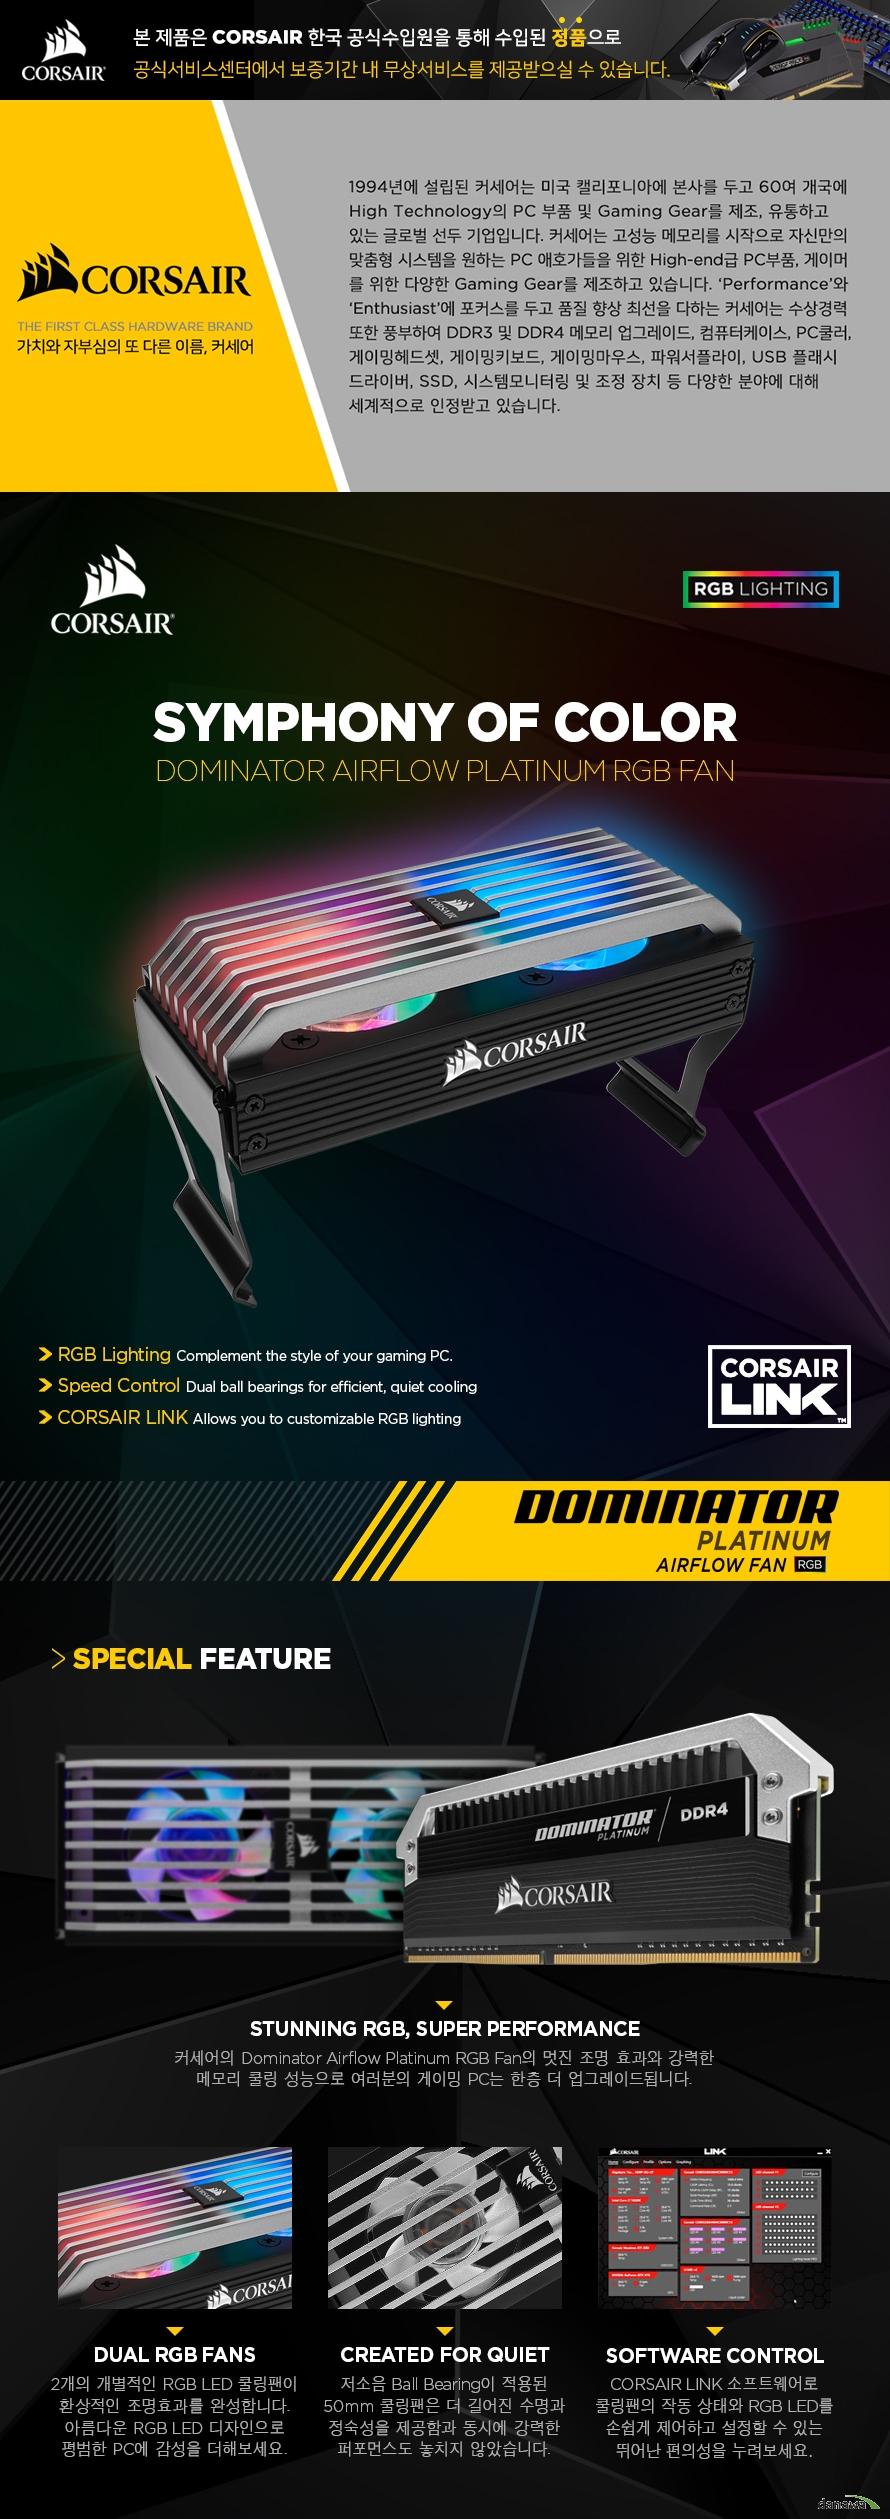 CORSAIR Dominator Airflow Platinum RGB Fan으로 여러분의 게이밍 PC는 한층 더 업그레이드됩니다. 놀라운 성능과 PC의 멋진 외관을 완성하는 디자인은 다른 차원의 게이밍 경험을 선사합니다.